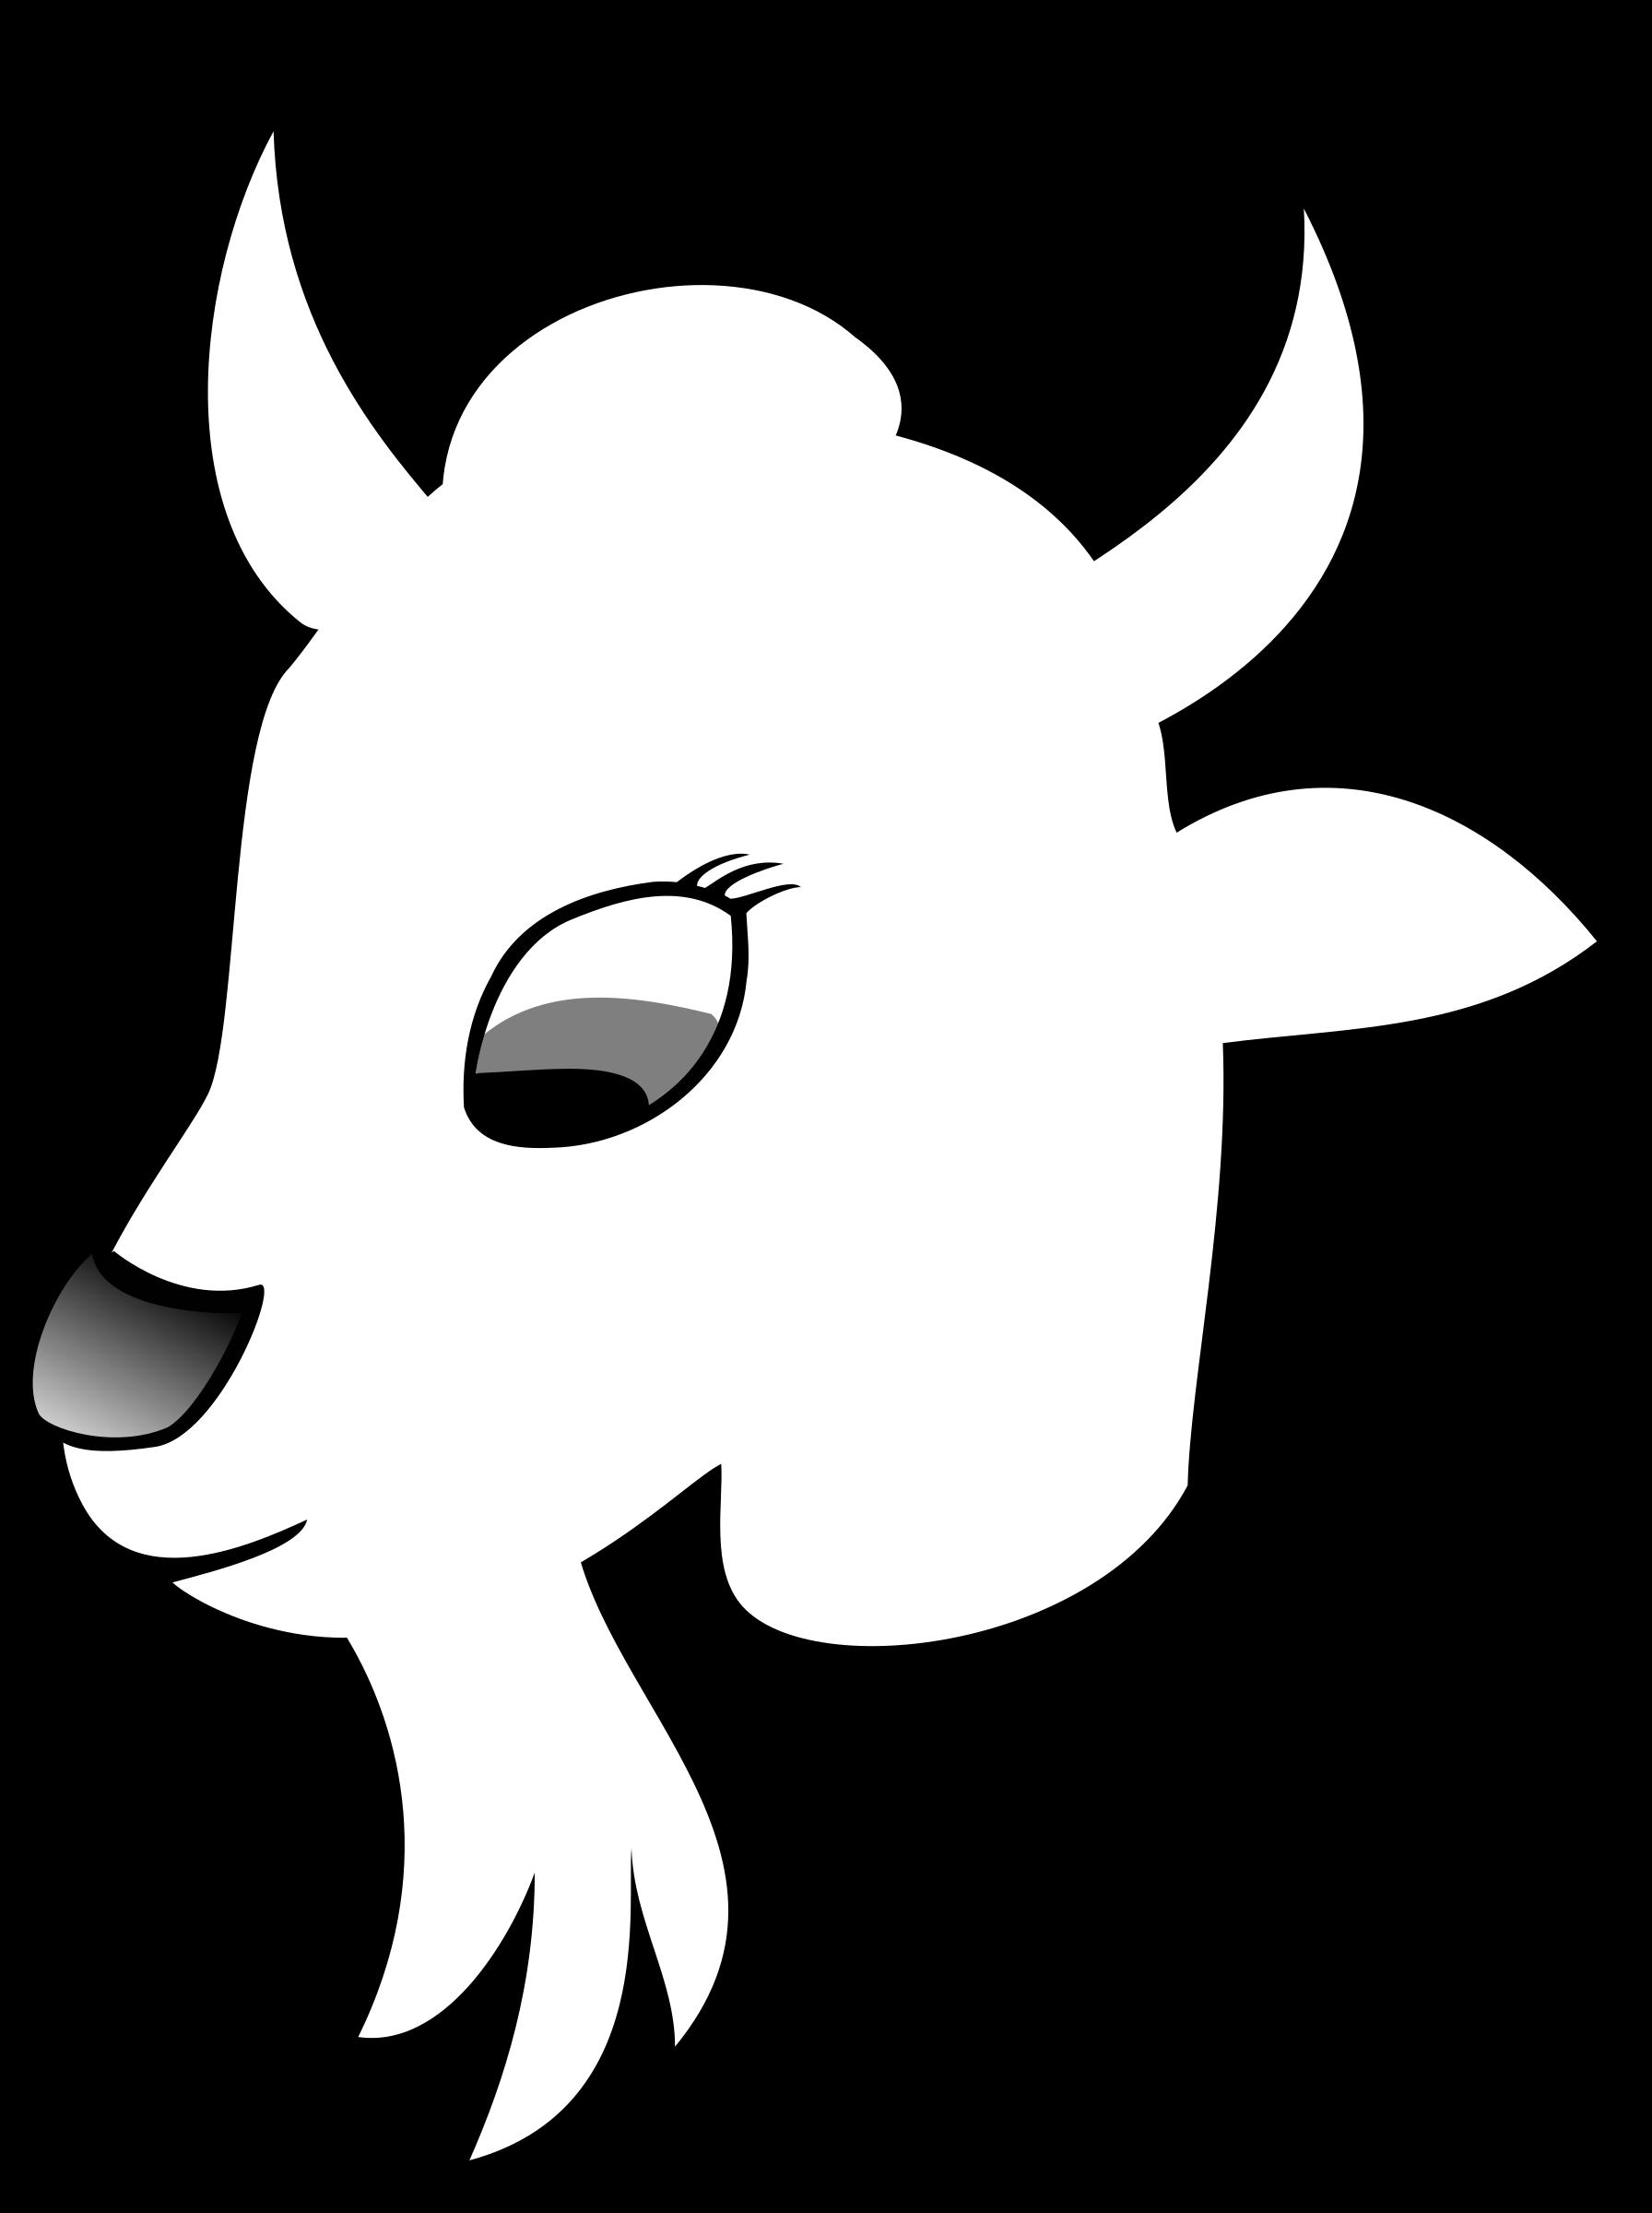 Line art big image. Goat clipart head